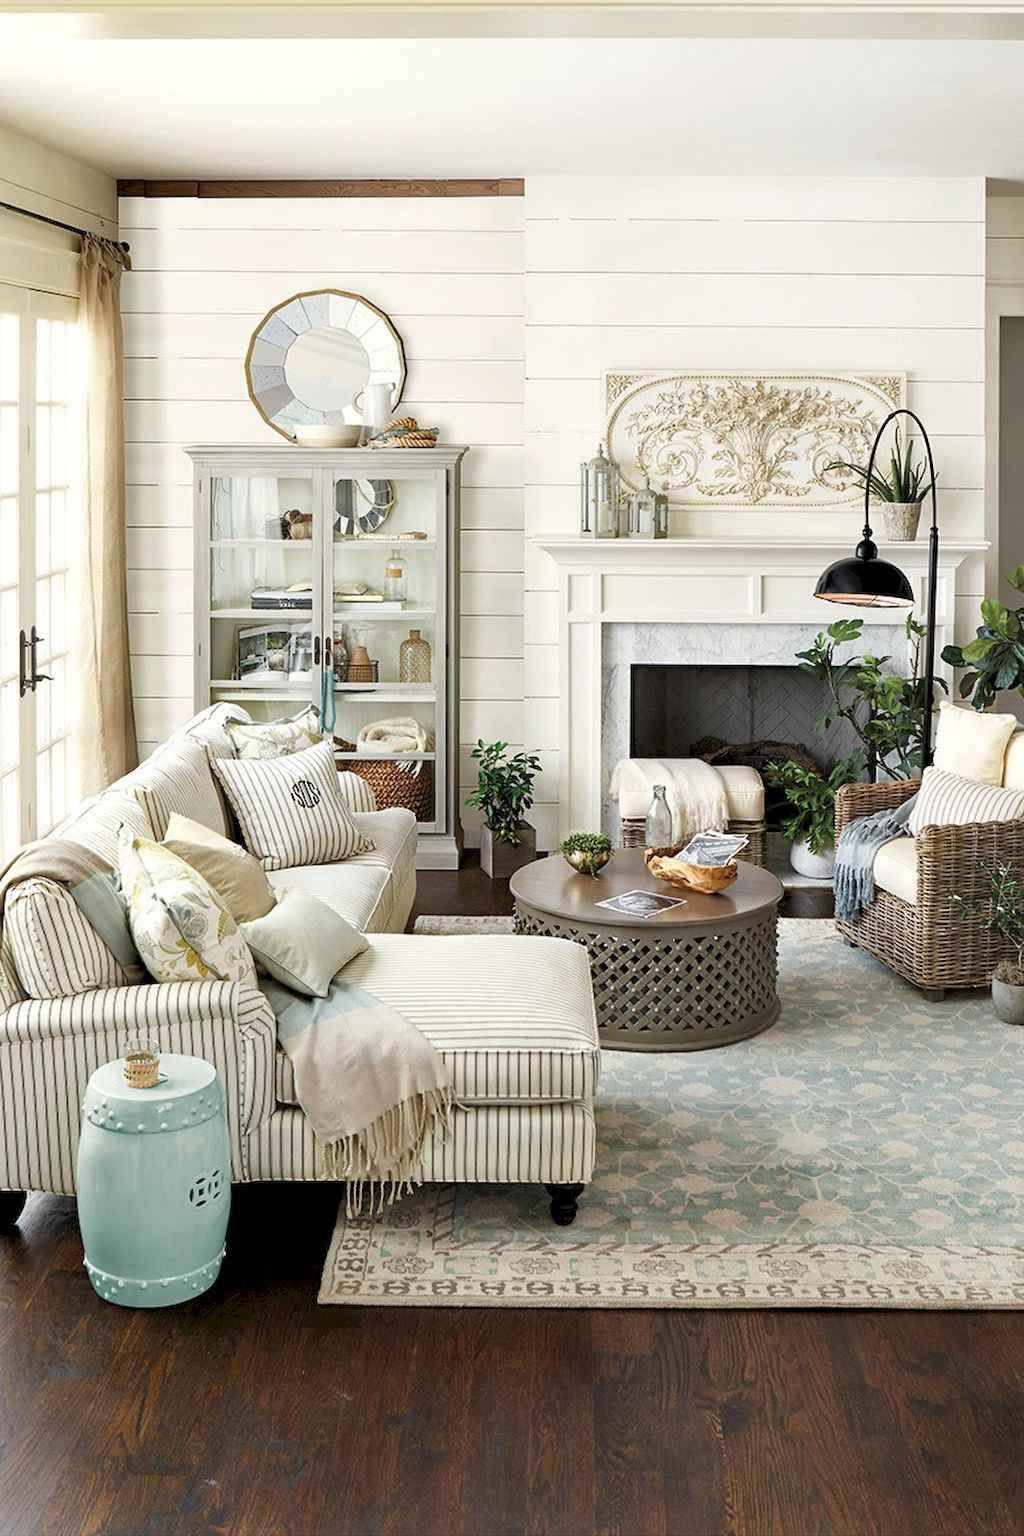 Simple clean vintage living room decorating ideas (2)